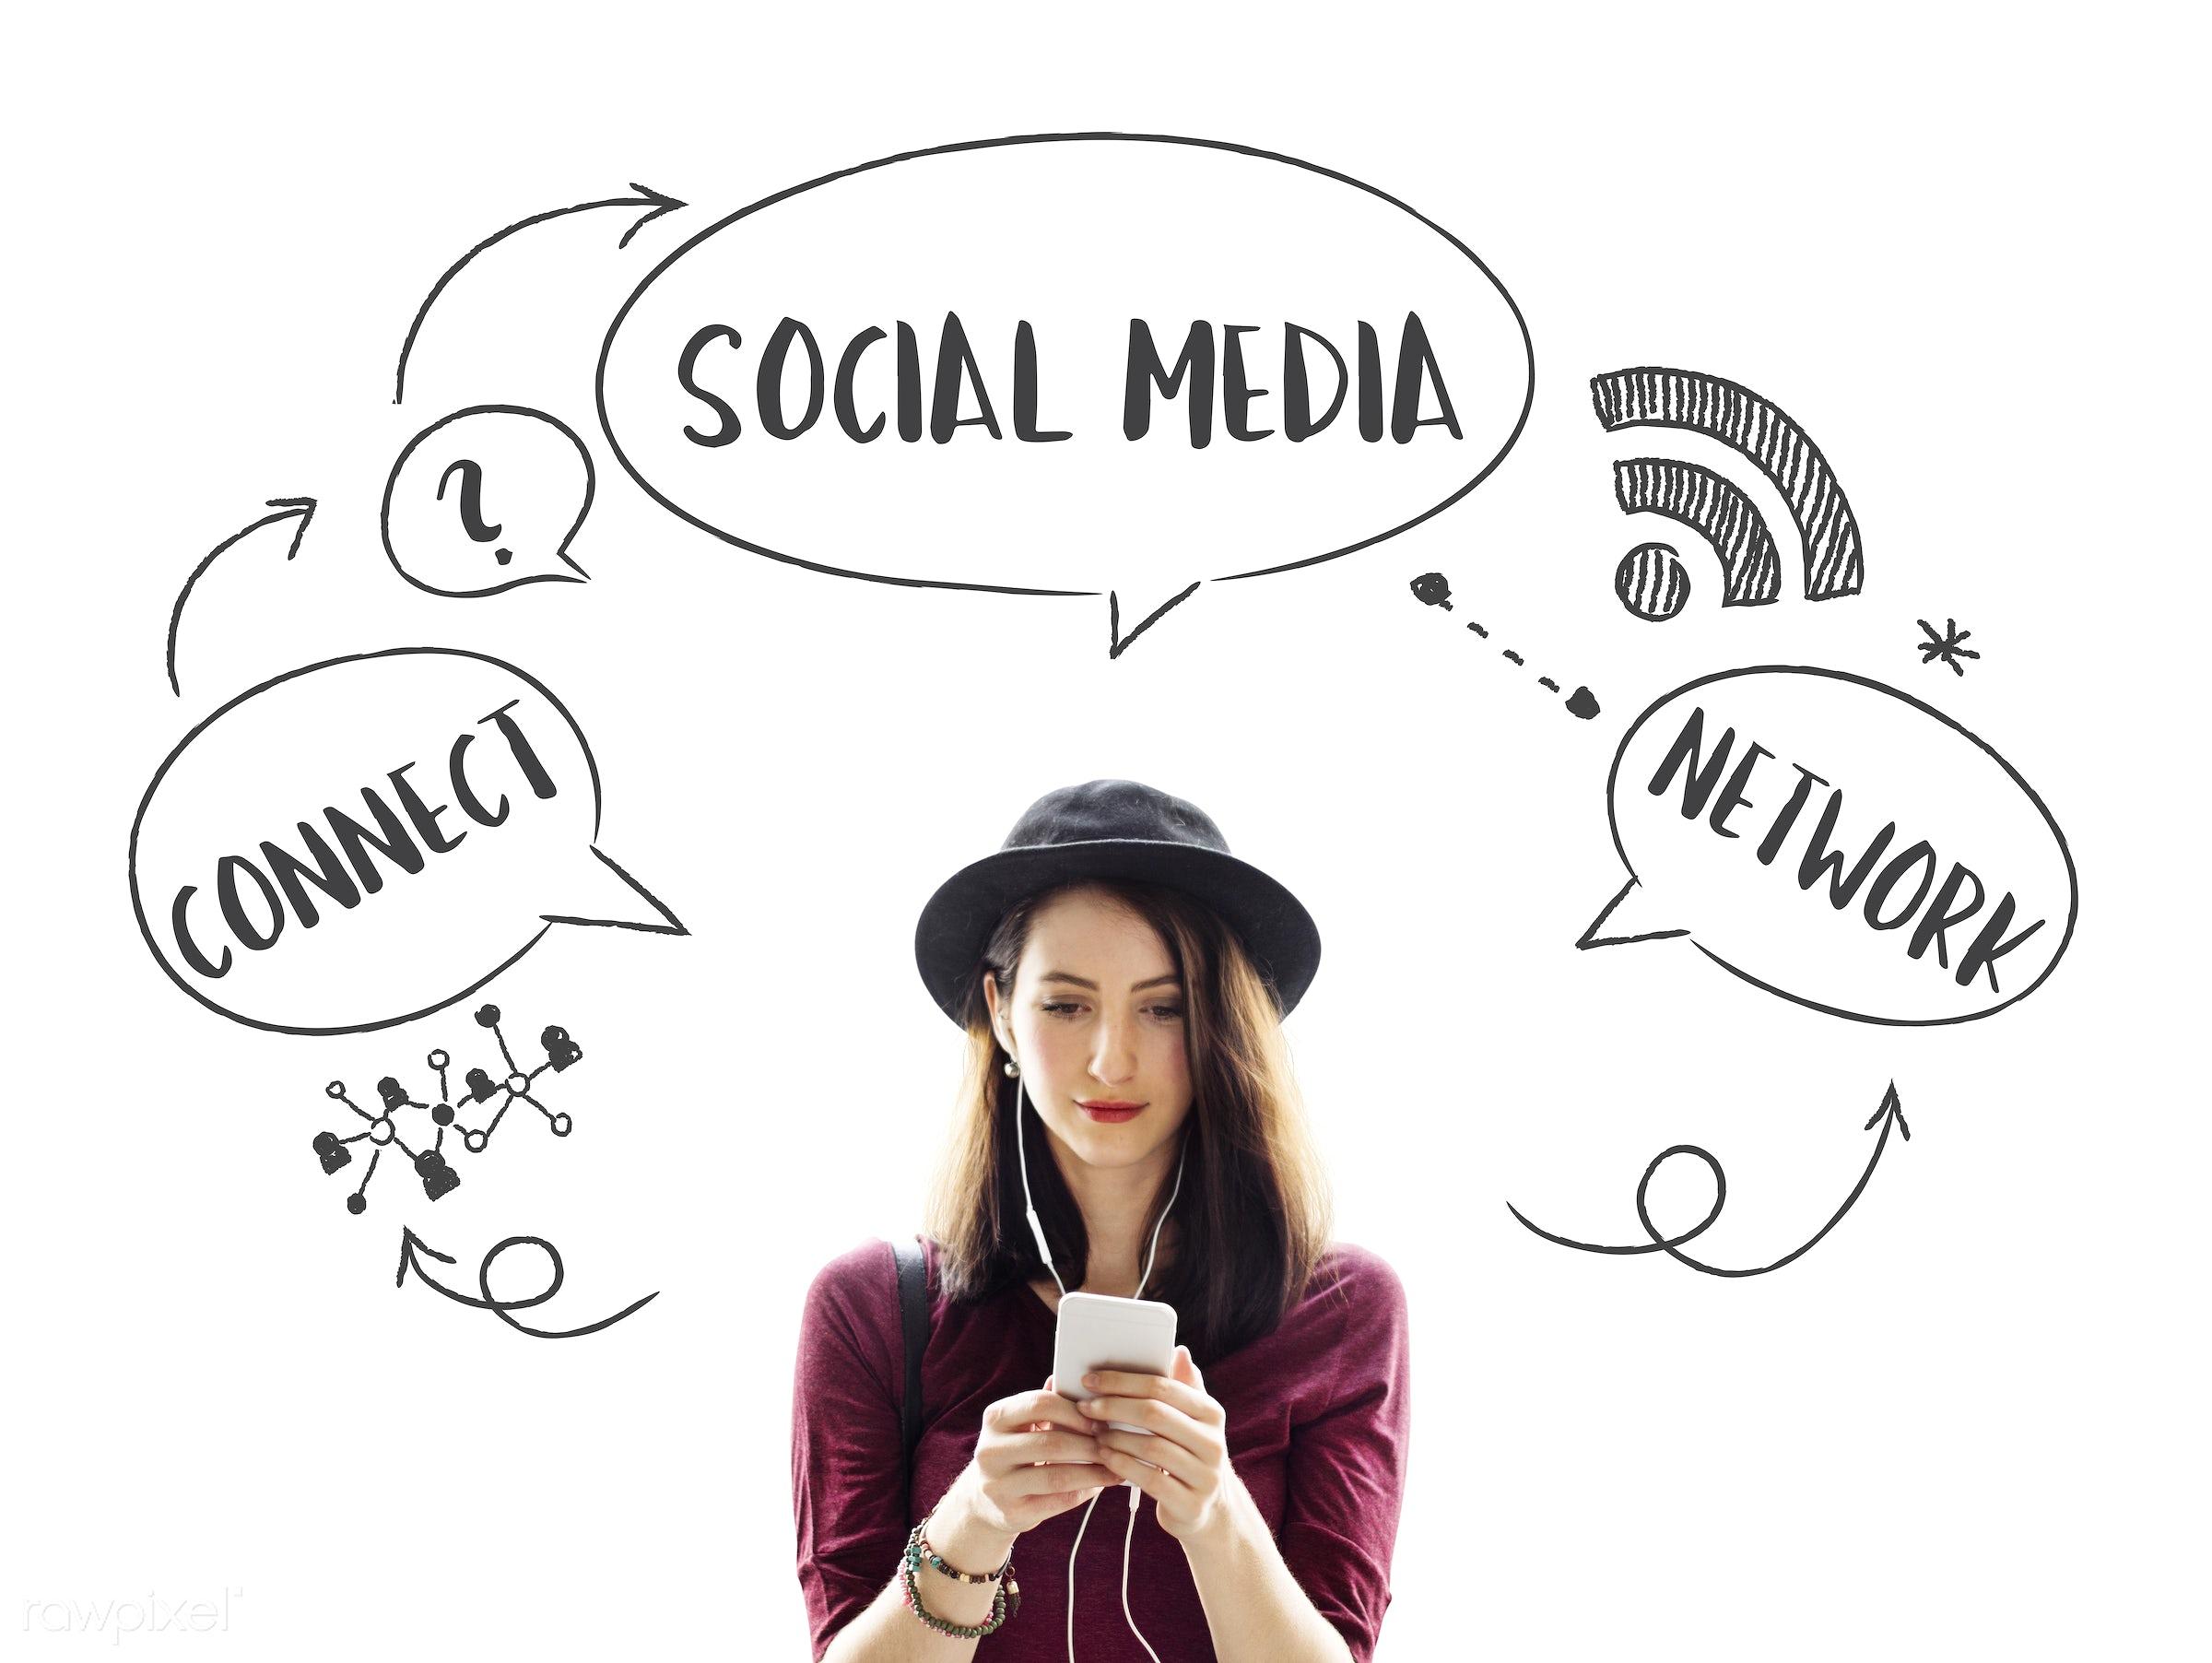 follow, blog, web, beautiful, casual, chat, chic, communication, community, connection, cute, digital, digital device,...